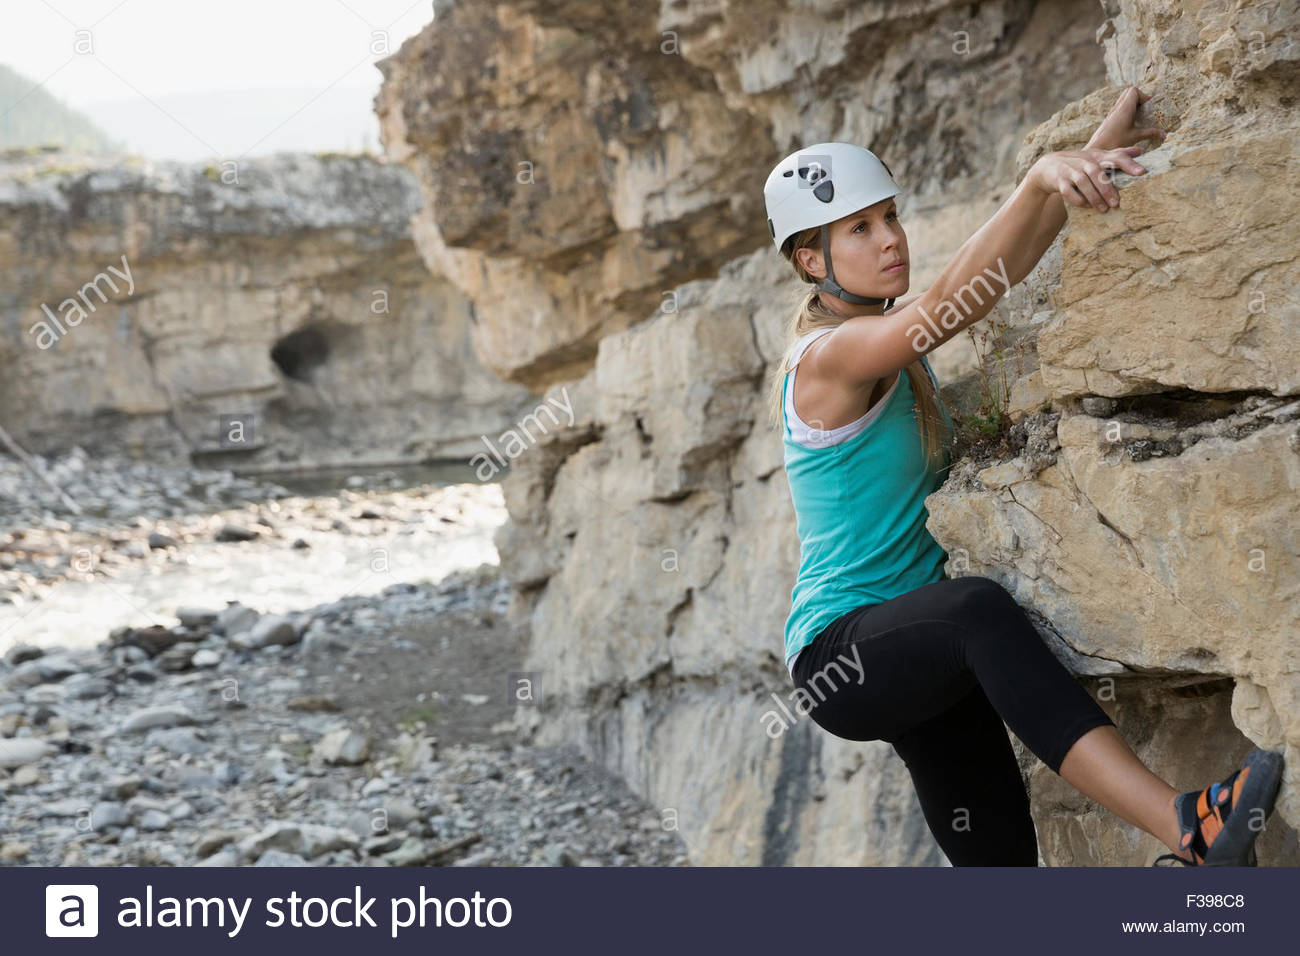 Female rock climber climbing rock formation - Stock Image